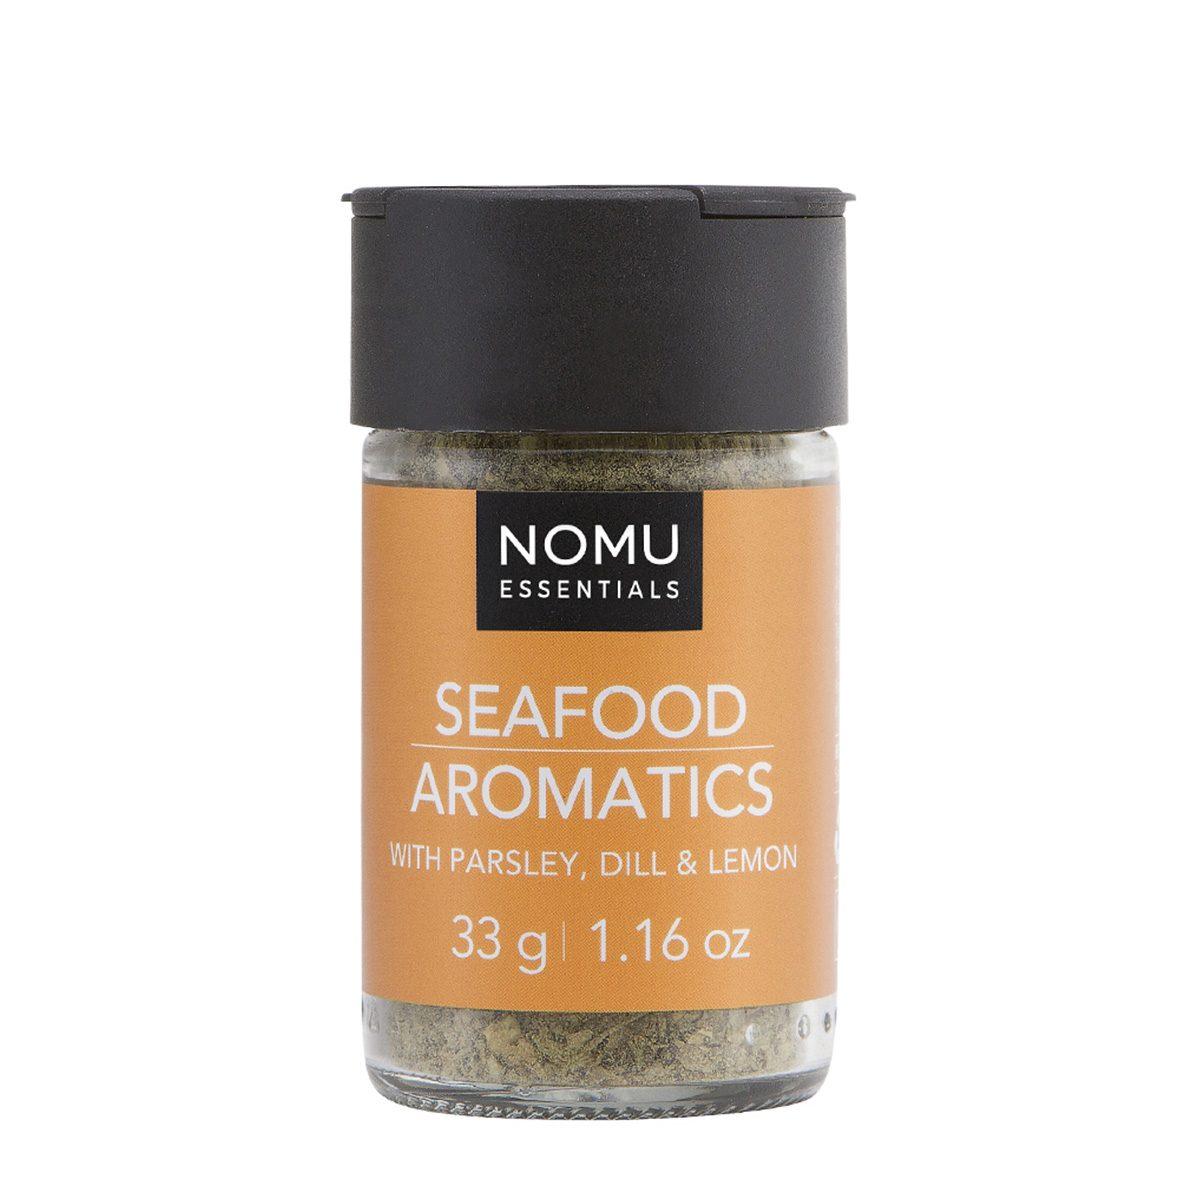 Seafood-Aromatics